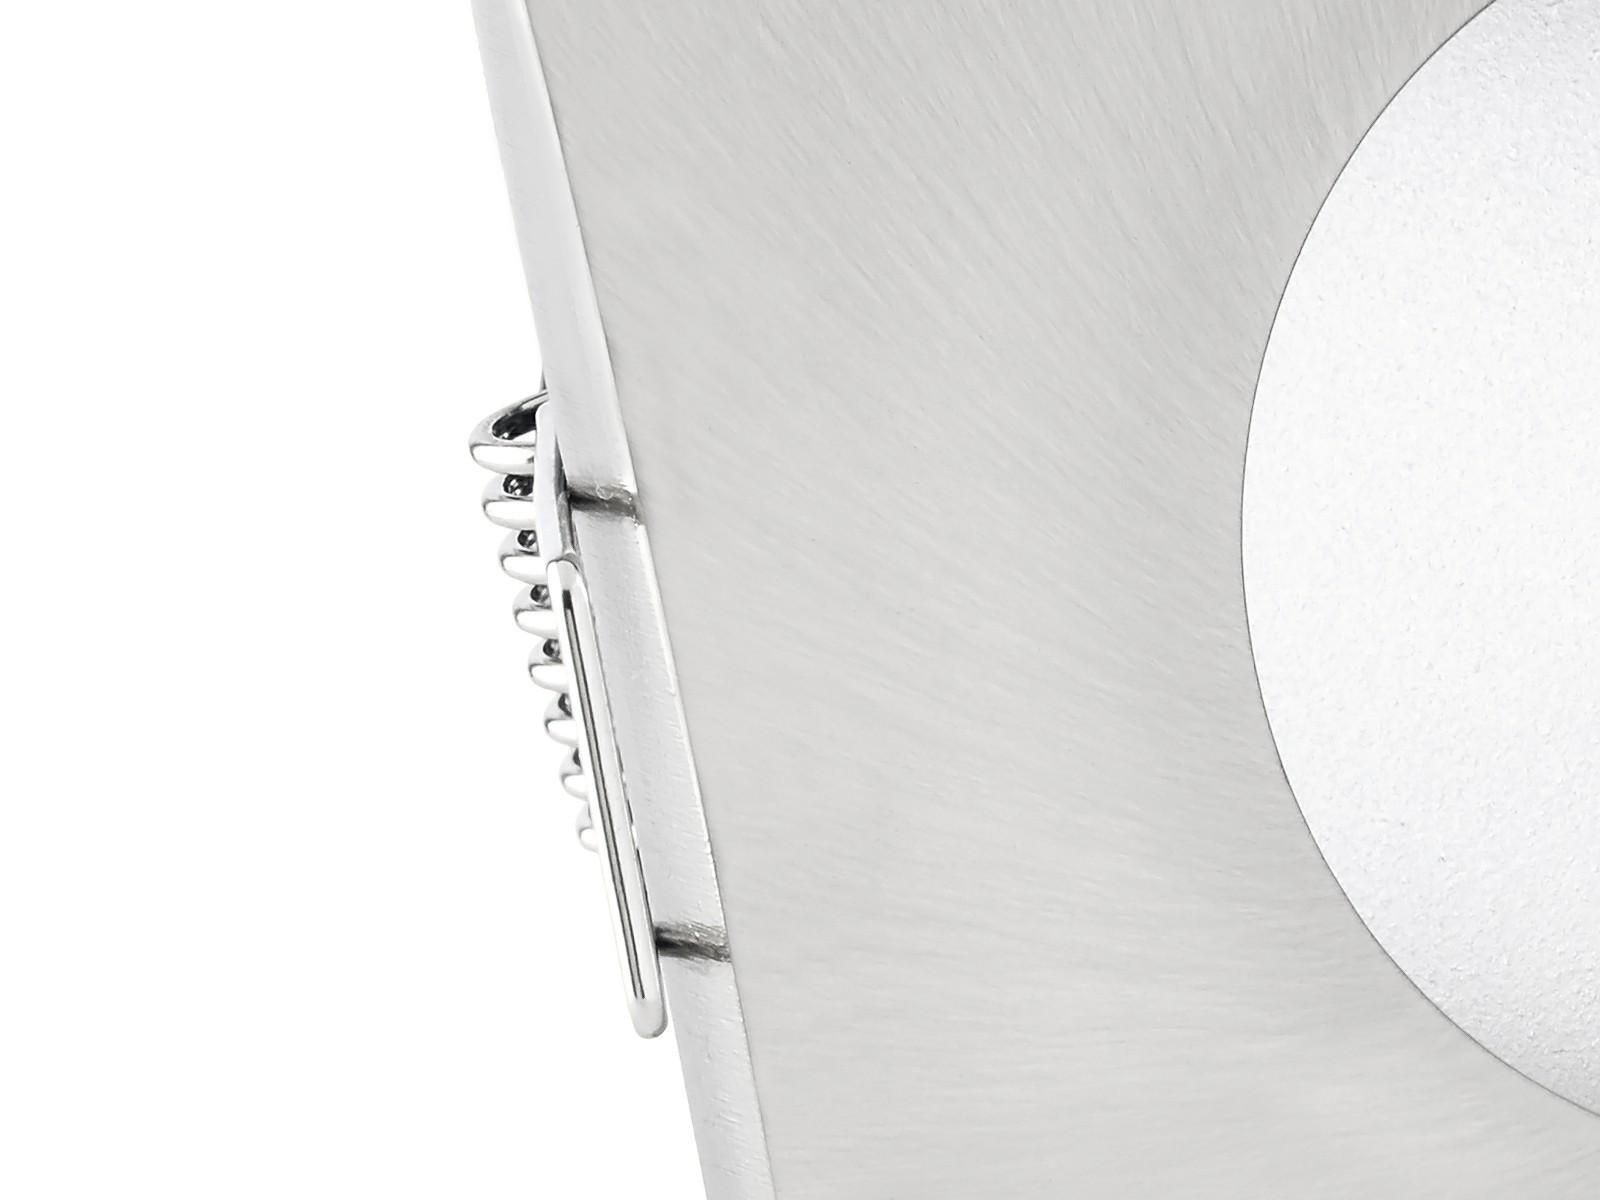 QW-1-alu-shop-detail-1600x1200 Schöne Osram Led Dimmbar Gu10 Dekorationen